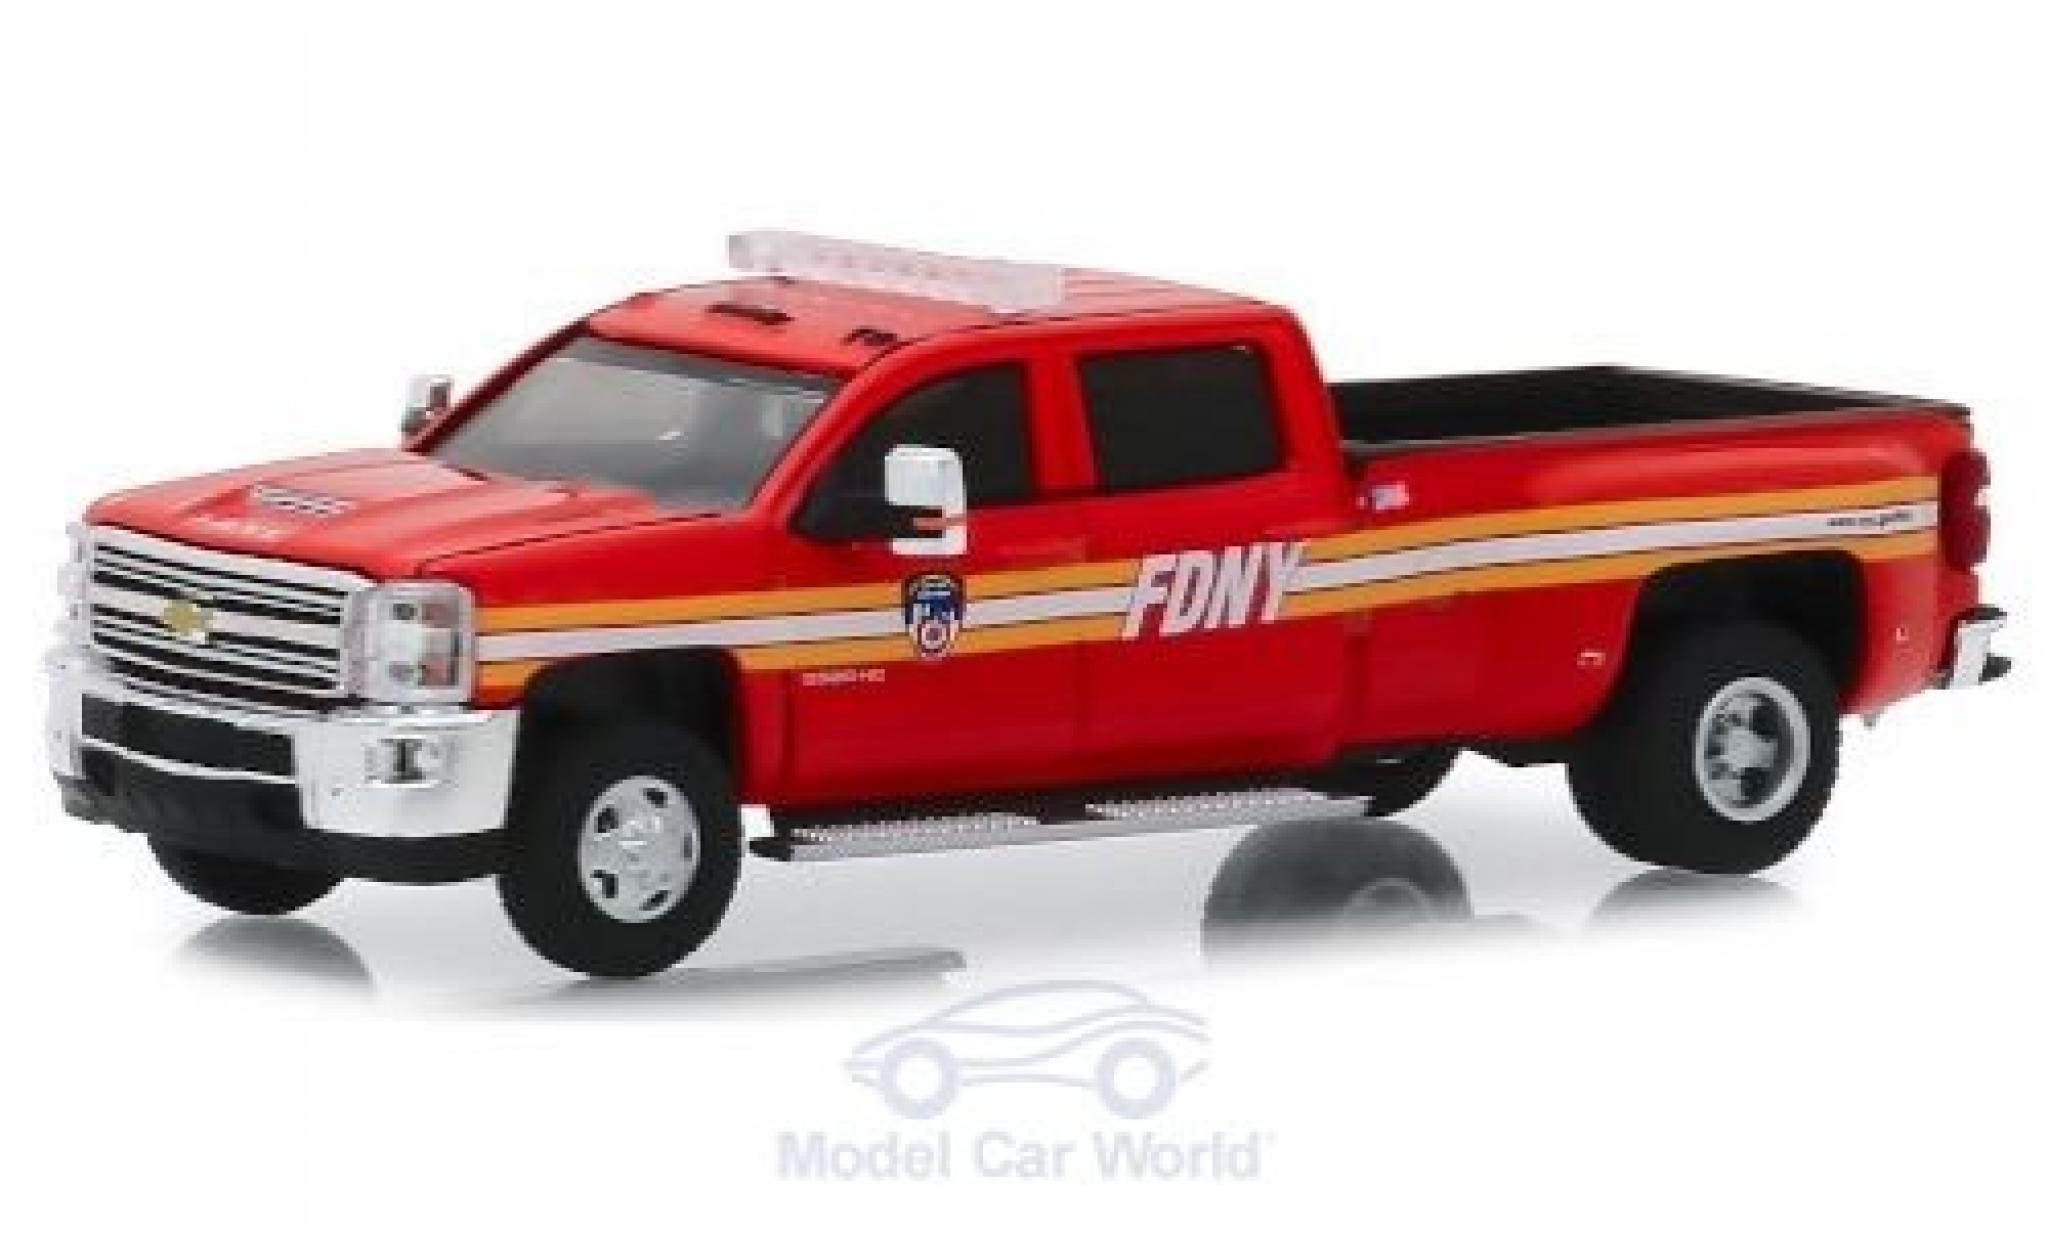 Chevrolet Silverado 1/64 Greenlight 3500HD FDNY 2018